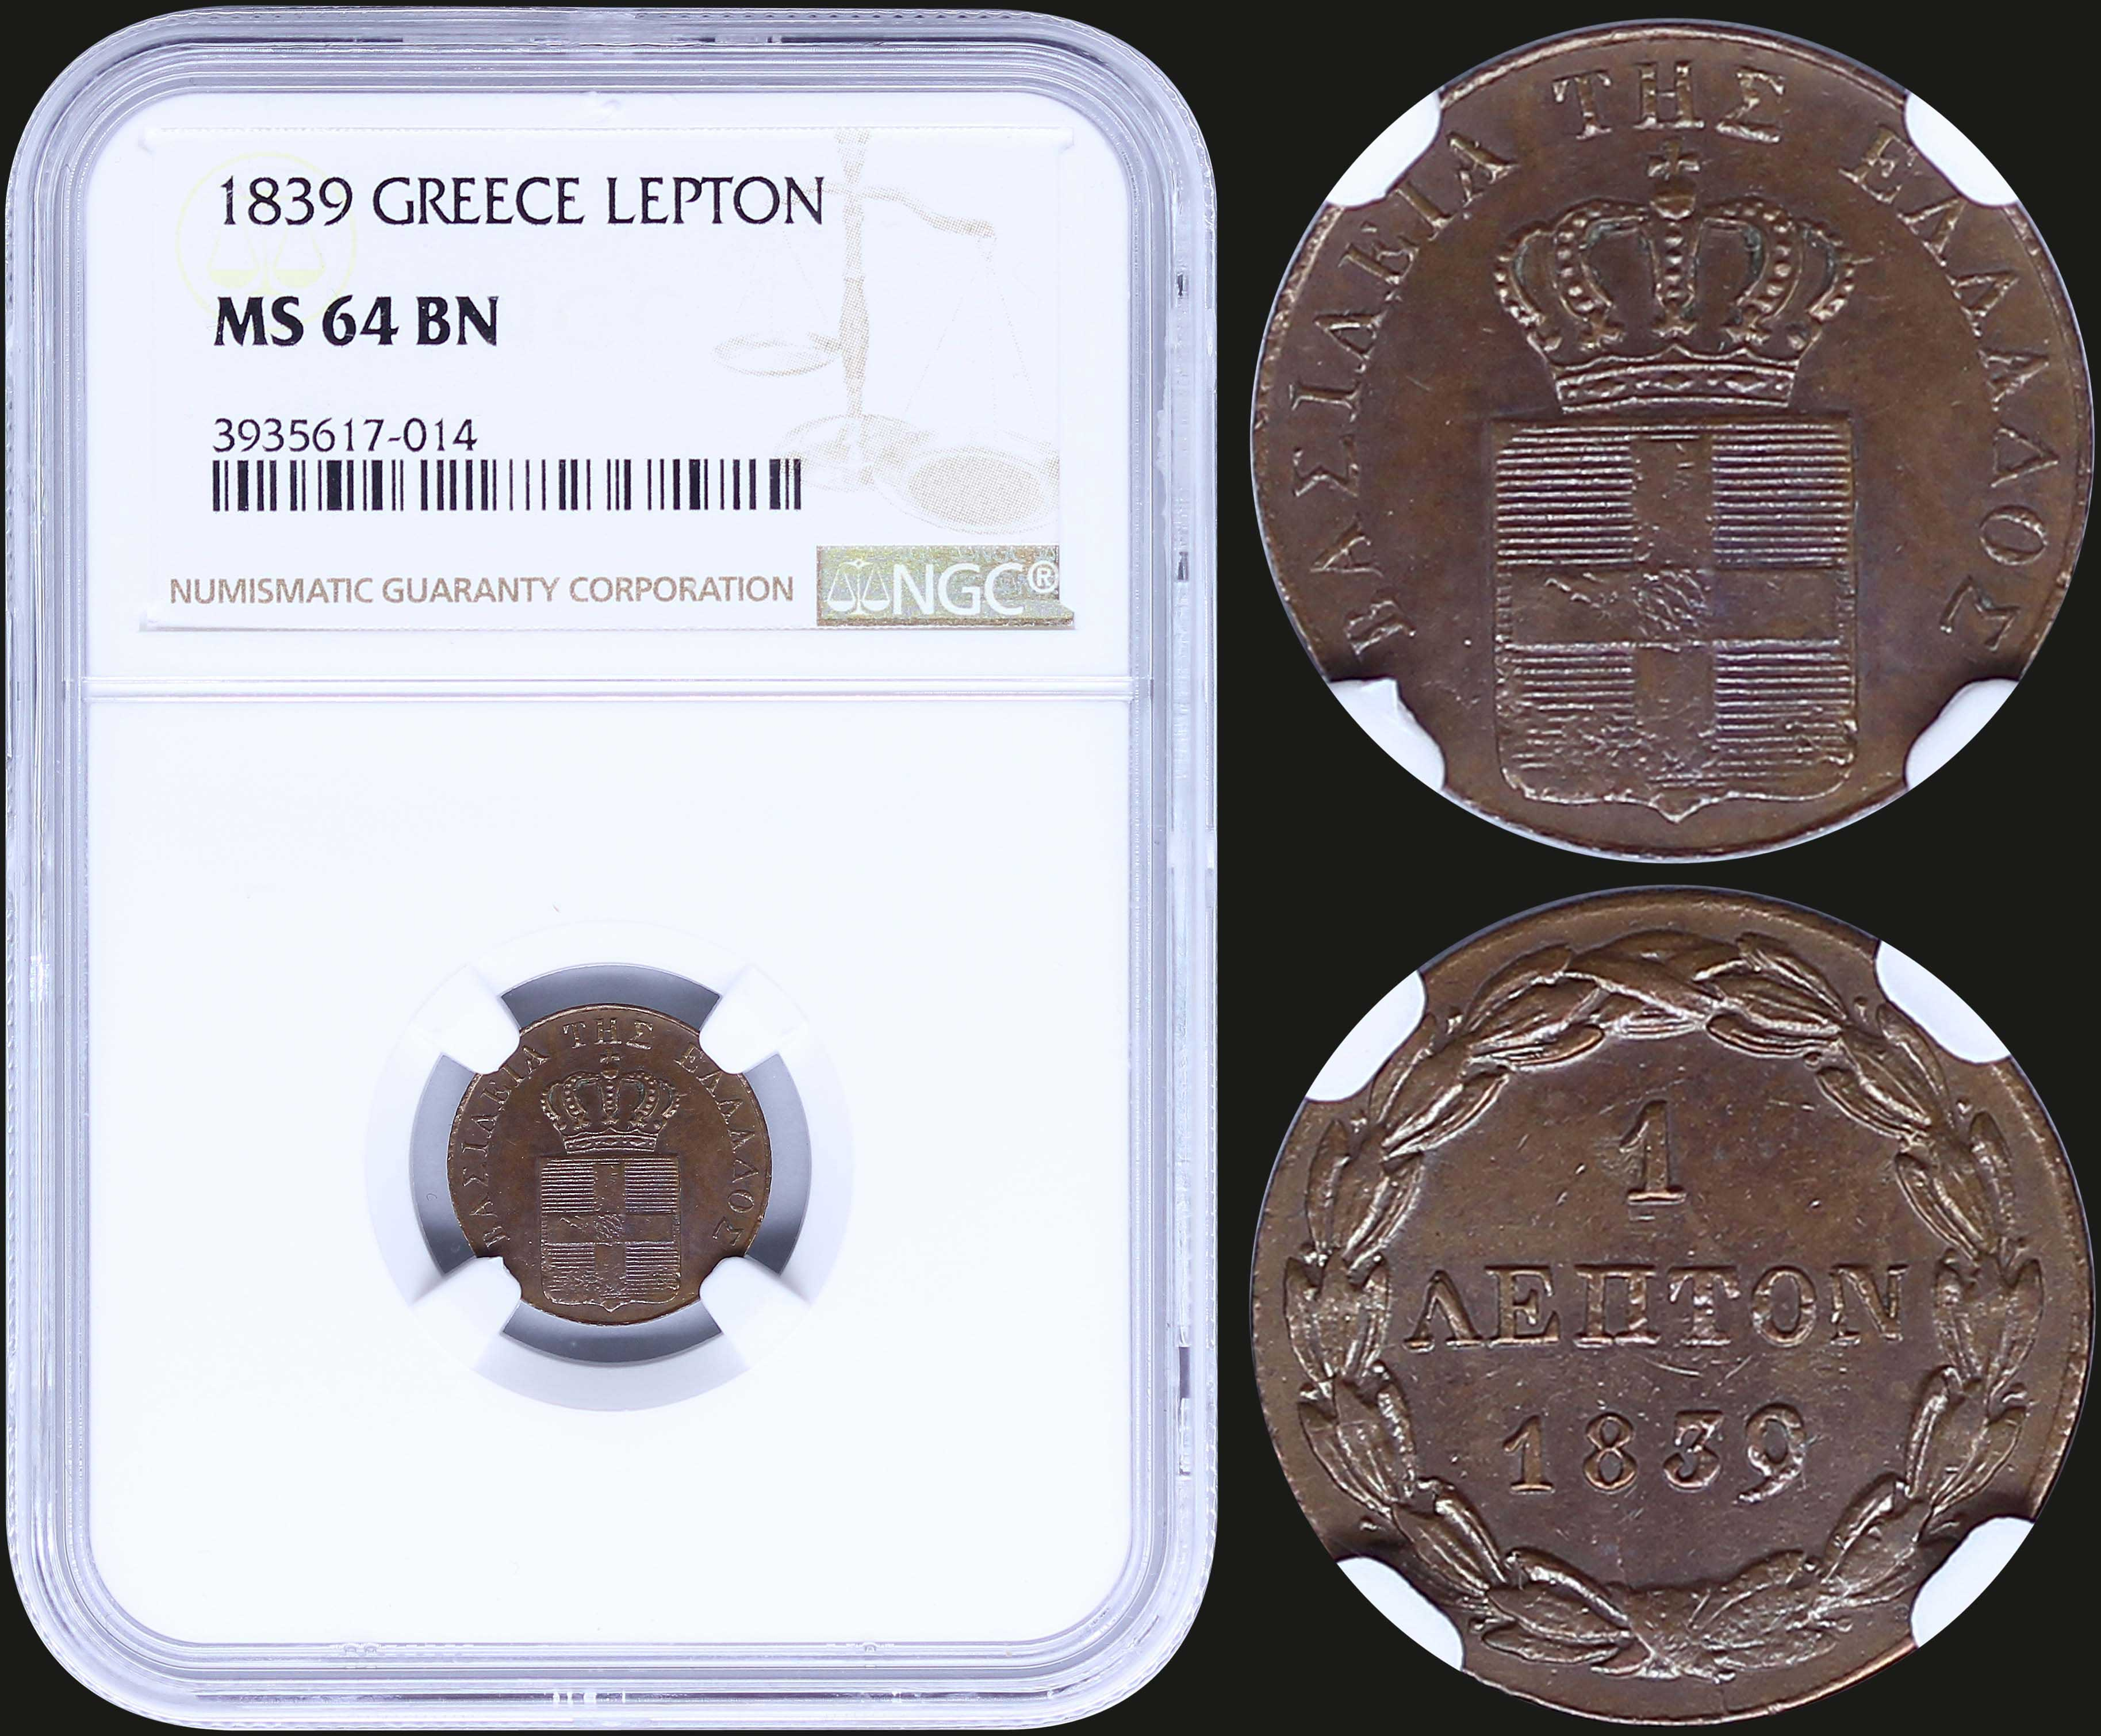 Lot 8093 - -  COINS & TOKENS king otto -  A. Karamitsos Public & Live Bid Auction 644 Coins, Medals & Banknotes